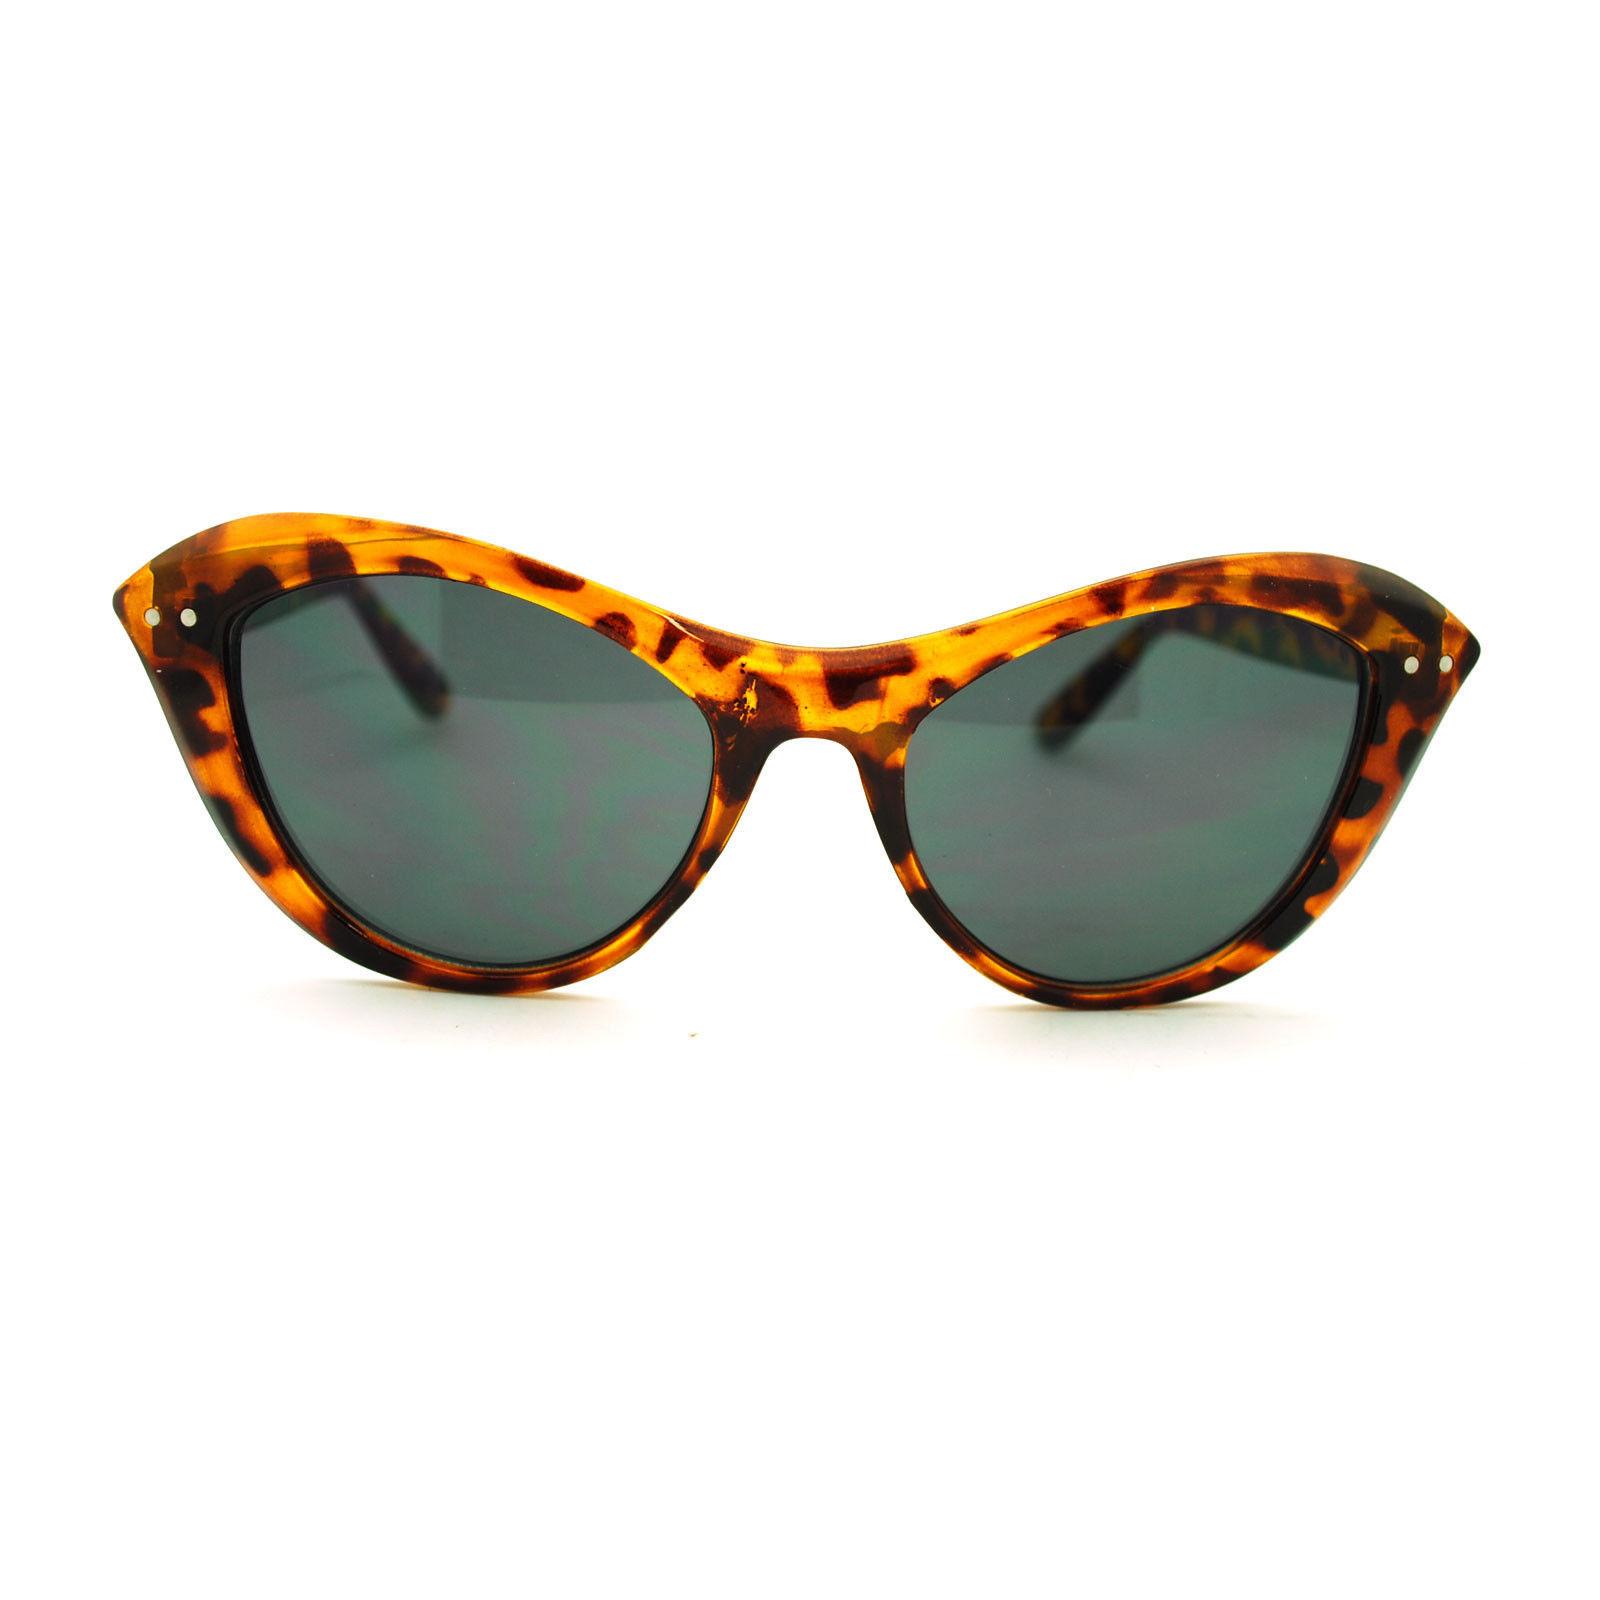 Narrow Retro Womens Cat Eye Thick Plastic 20s Brow Designer Fashion Sunglasses